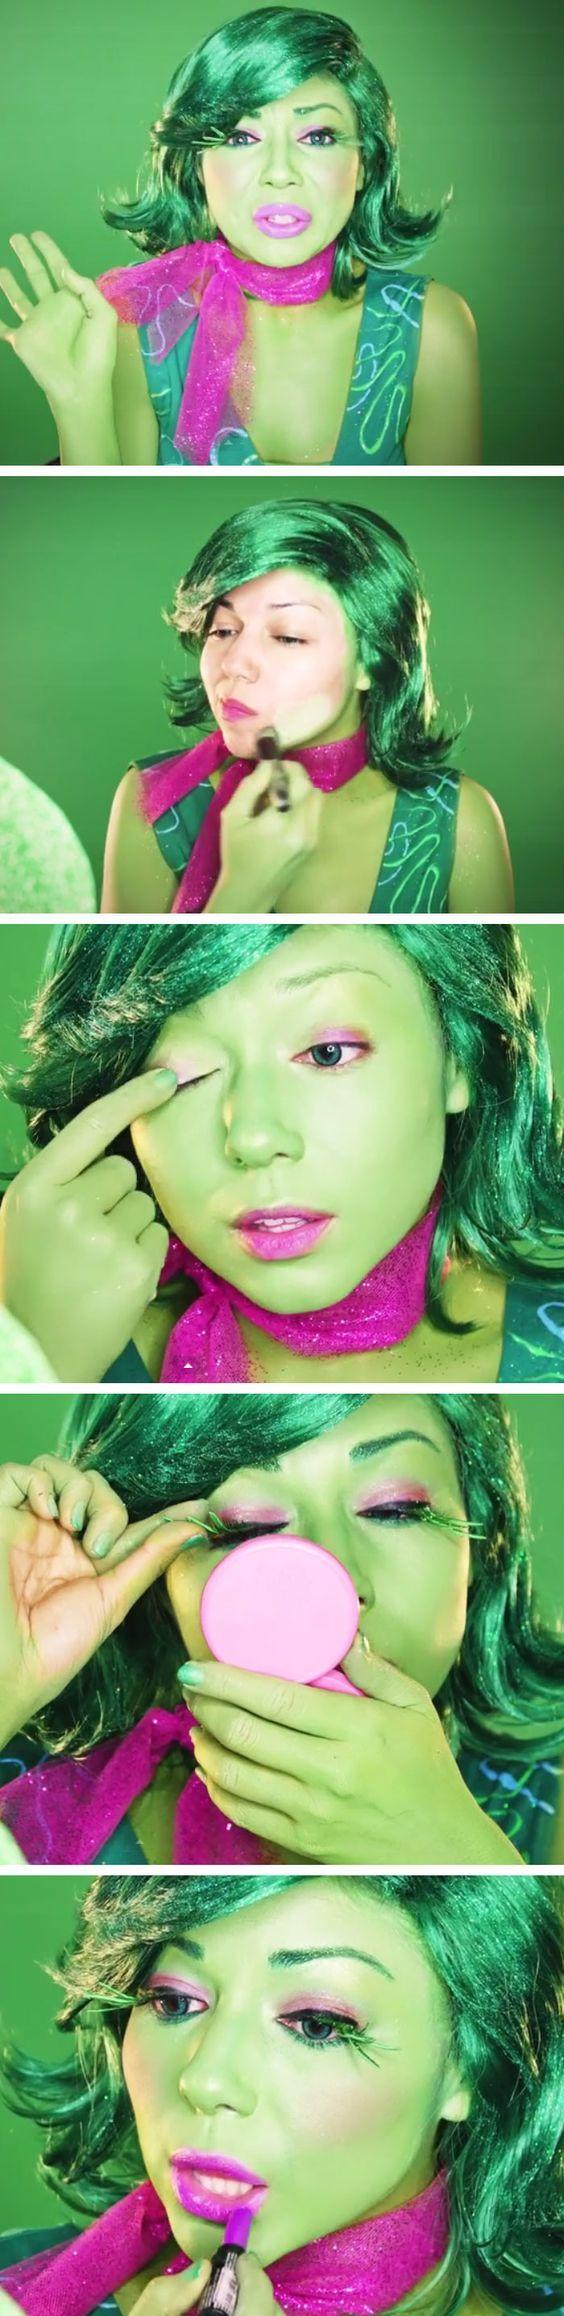 Alles steht Kopf Ekel Kostüm selber machen | Kostüm Idee zu Karneval, Halloween & Fasching